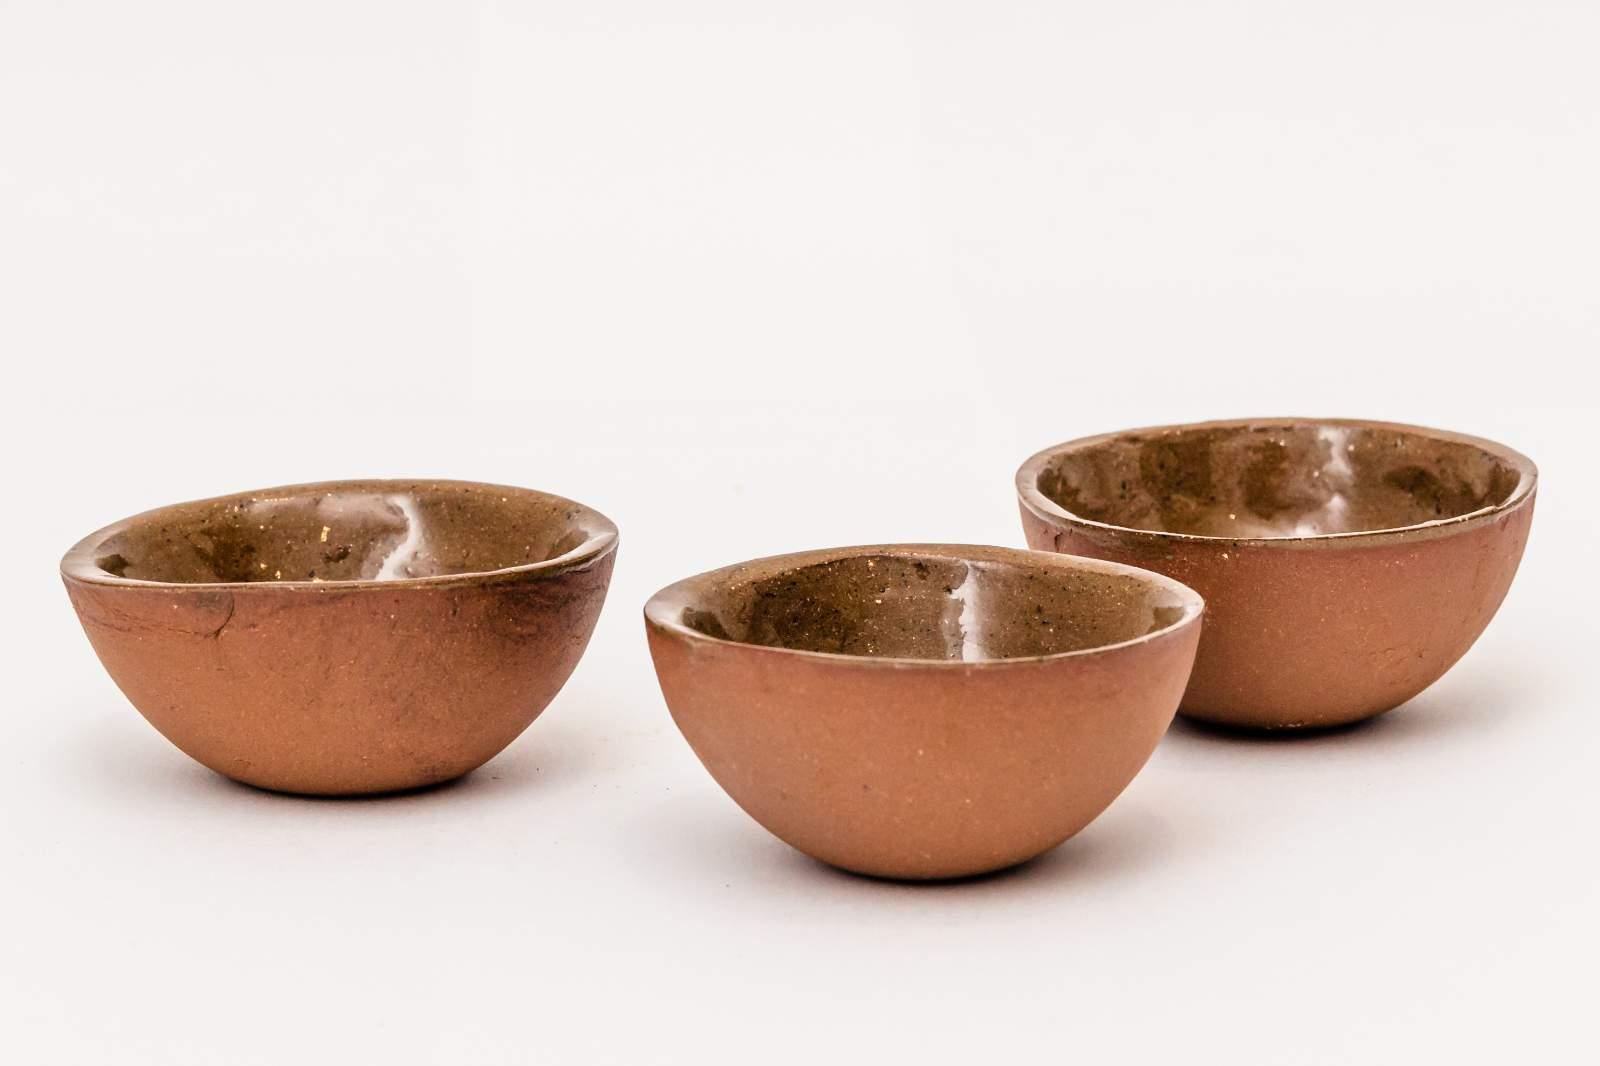 Tapaskommetjes, set van 3, diameter 6 à 6,5 cm